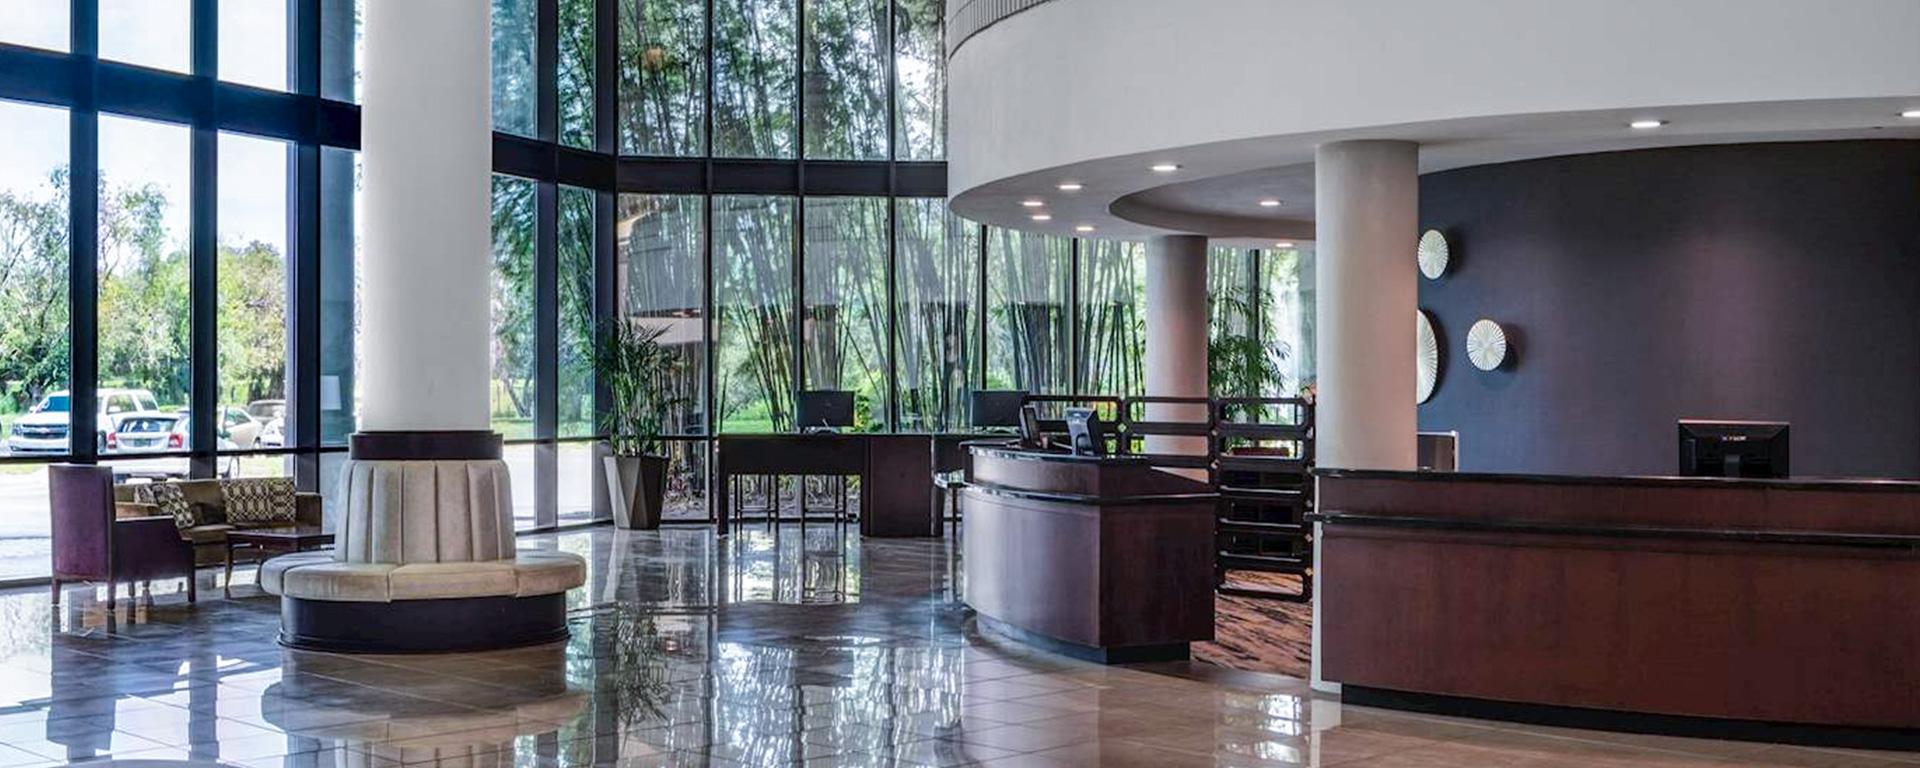 Linchris Hotel Corporation team